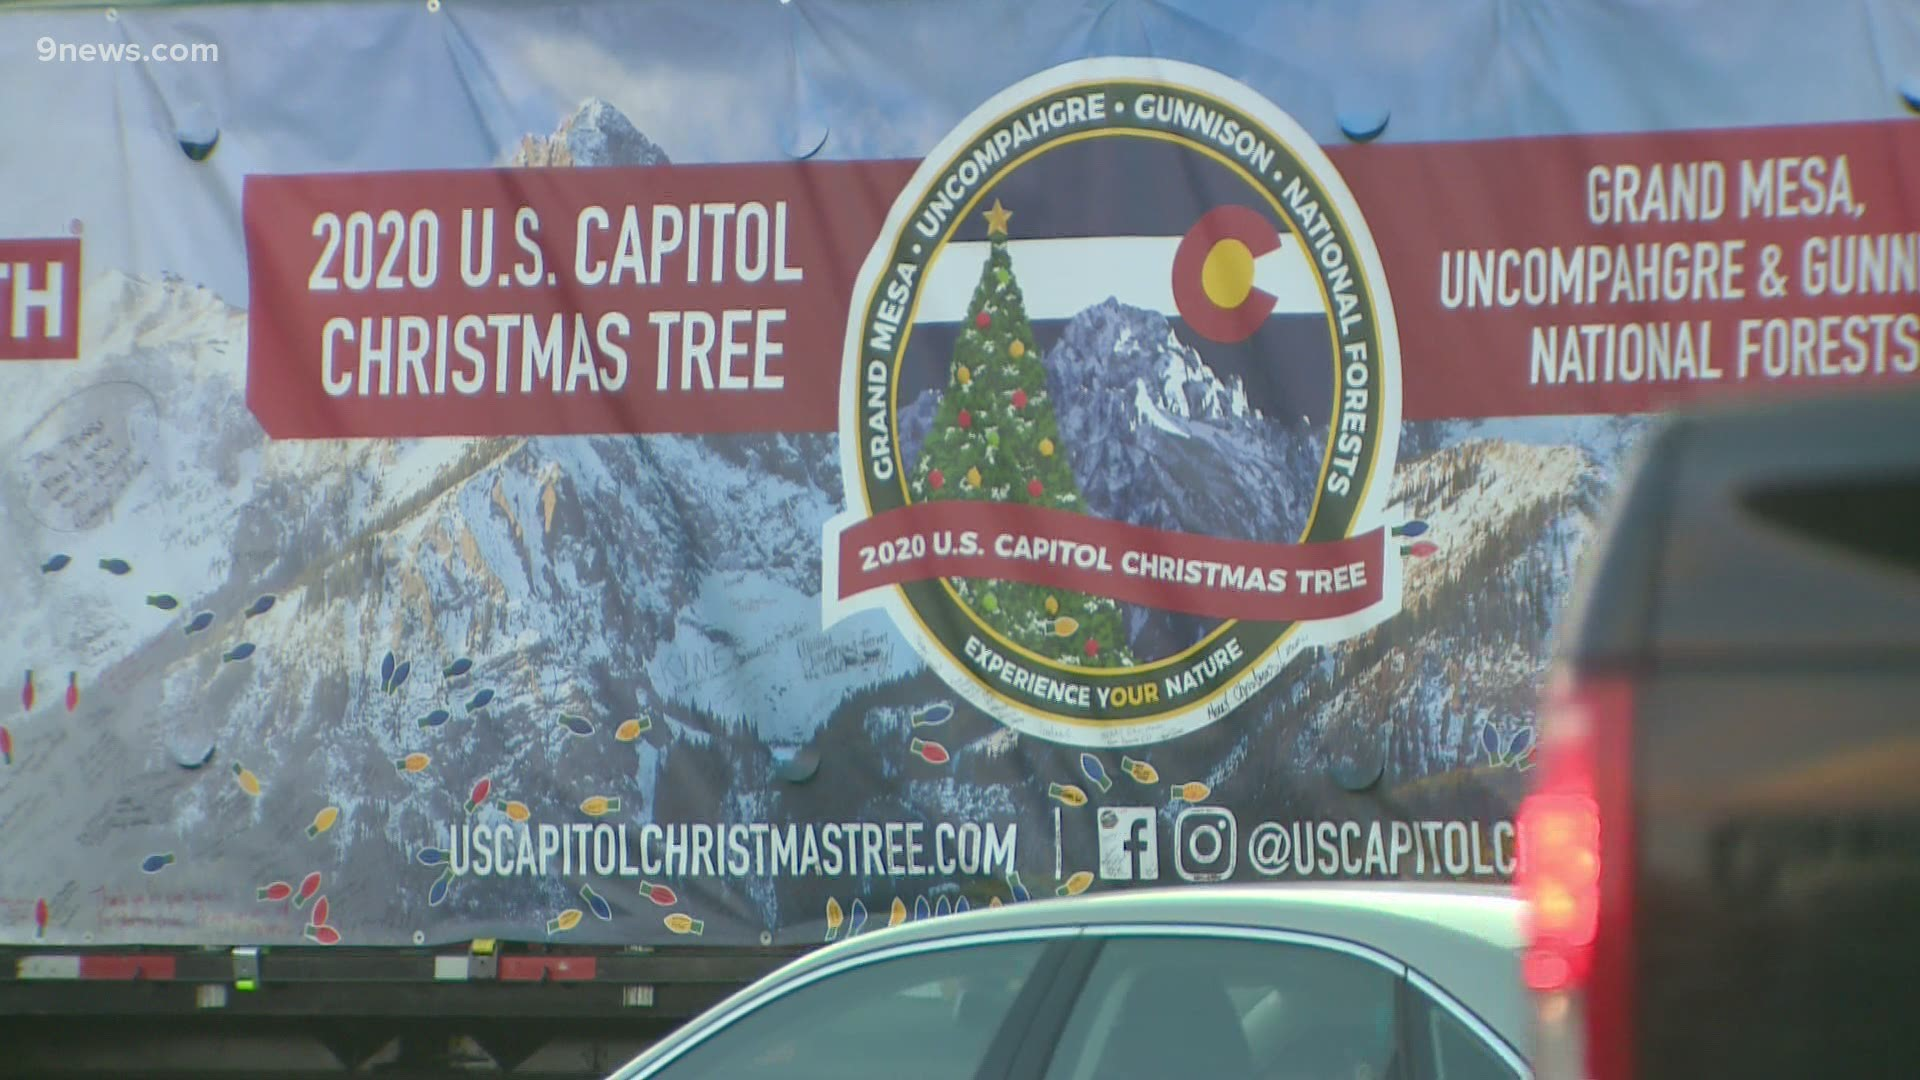 U.S. Capitol 2020 Christmas tree arrives in Washington, D.C.